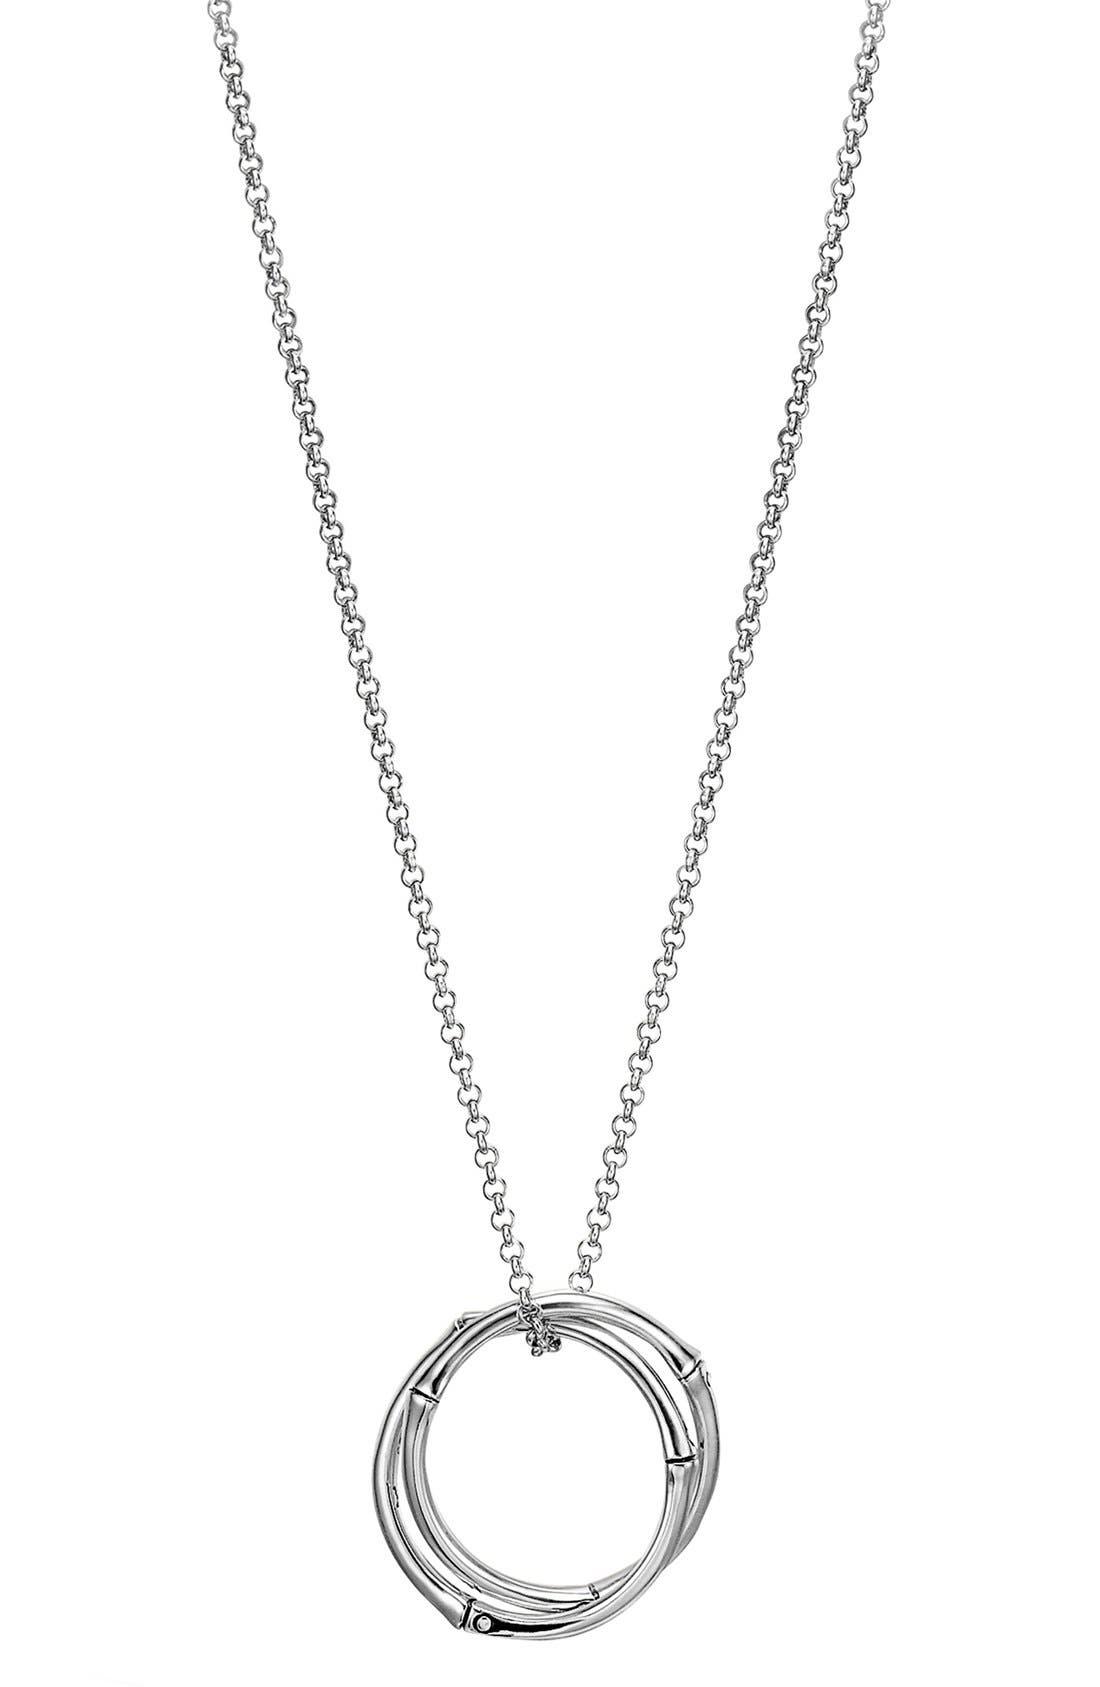 John Hardy 'Bamboo' Circle Pendant Necklace